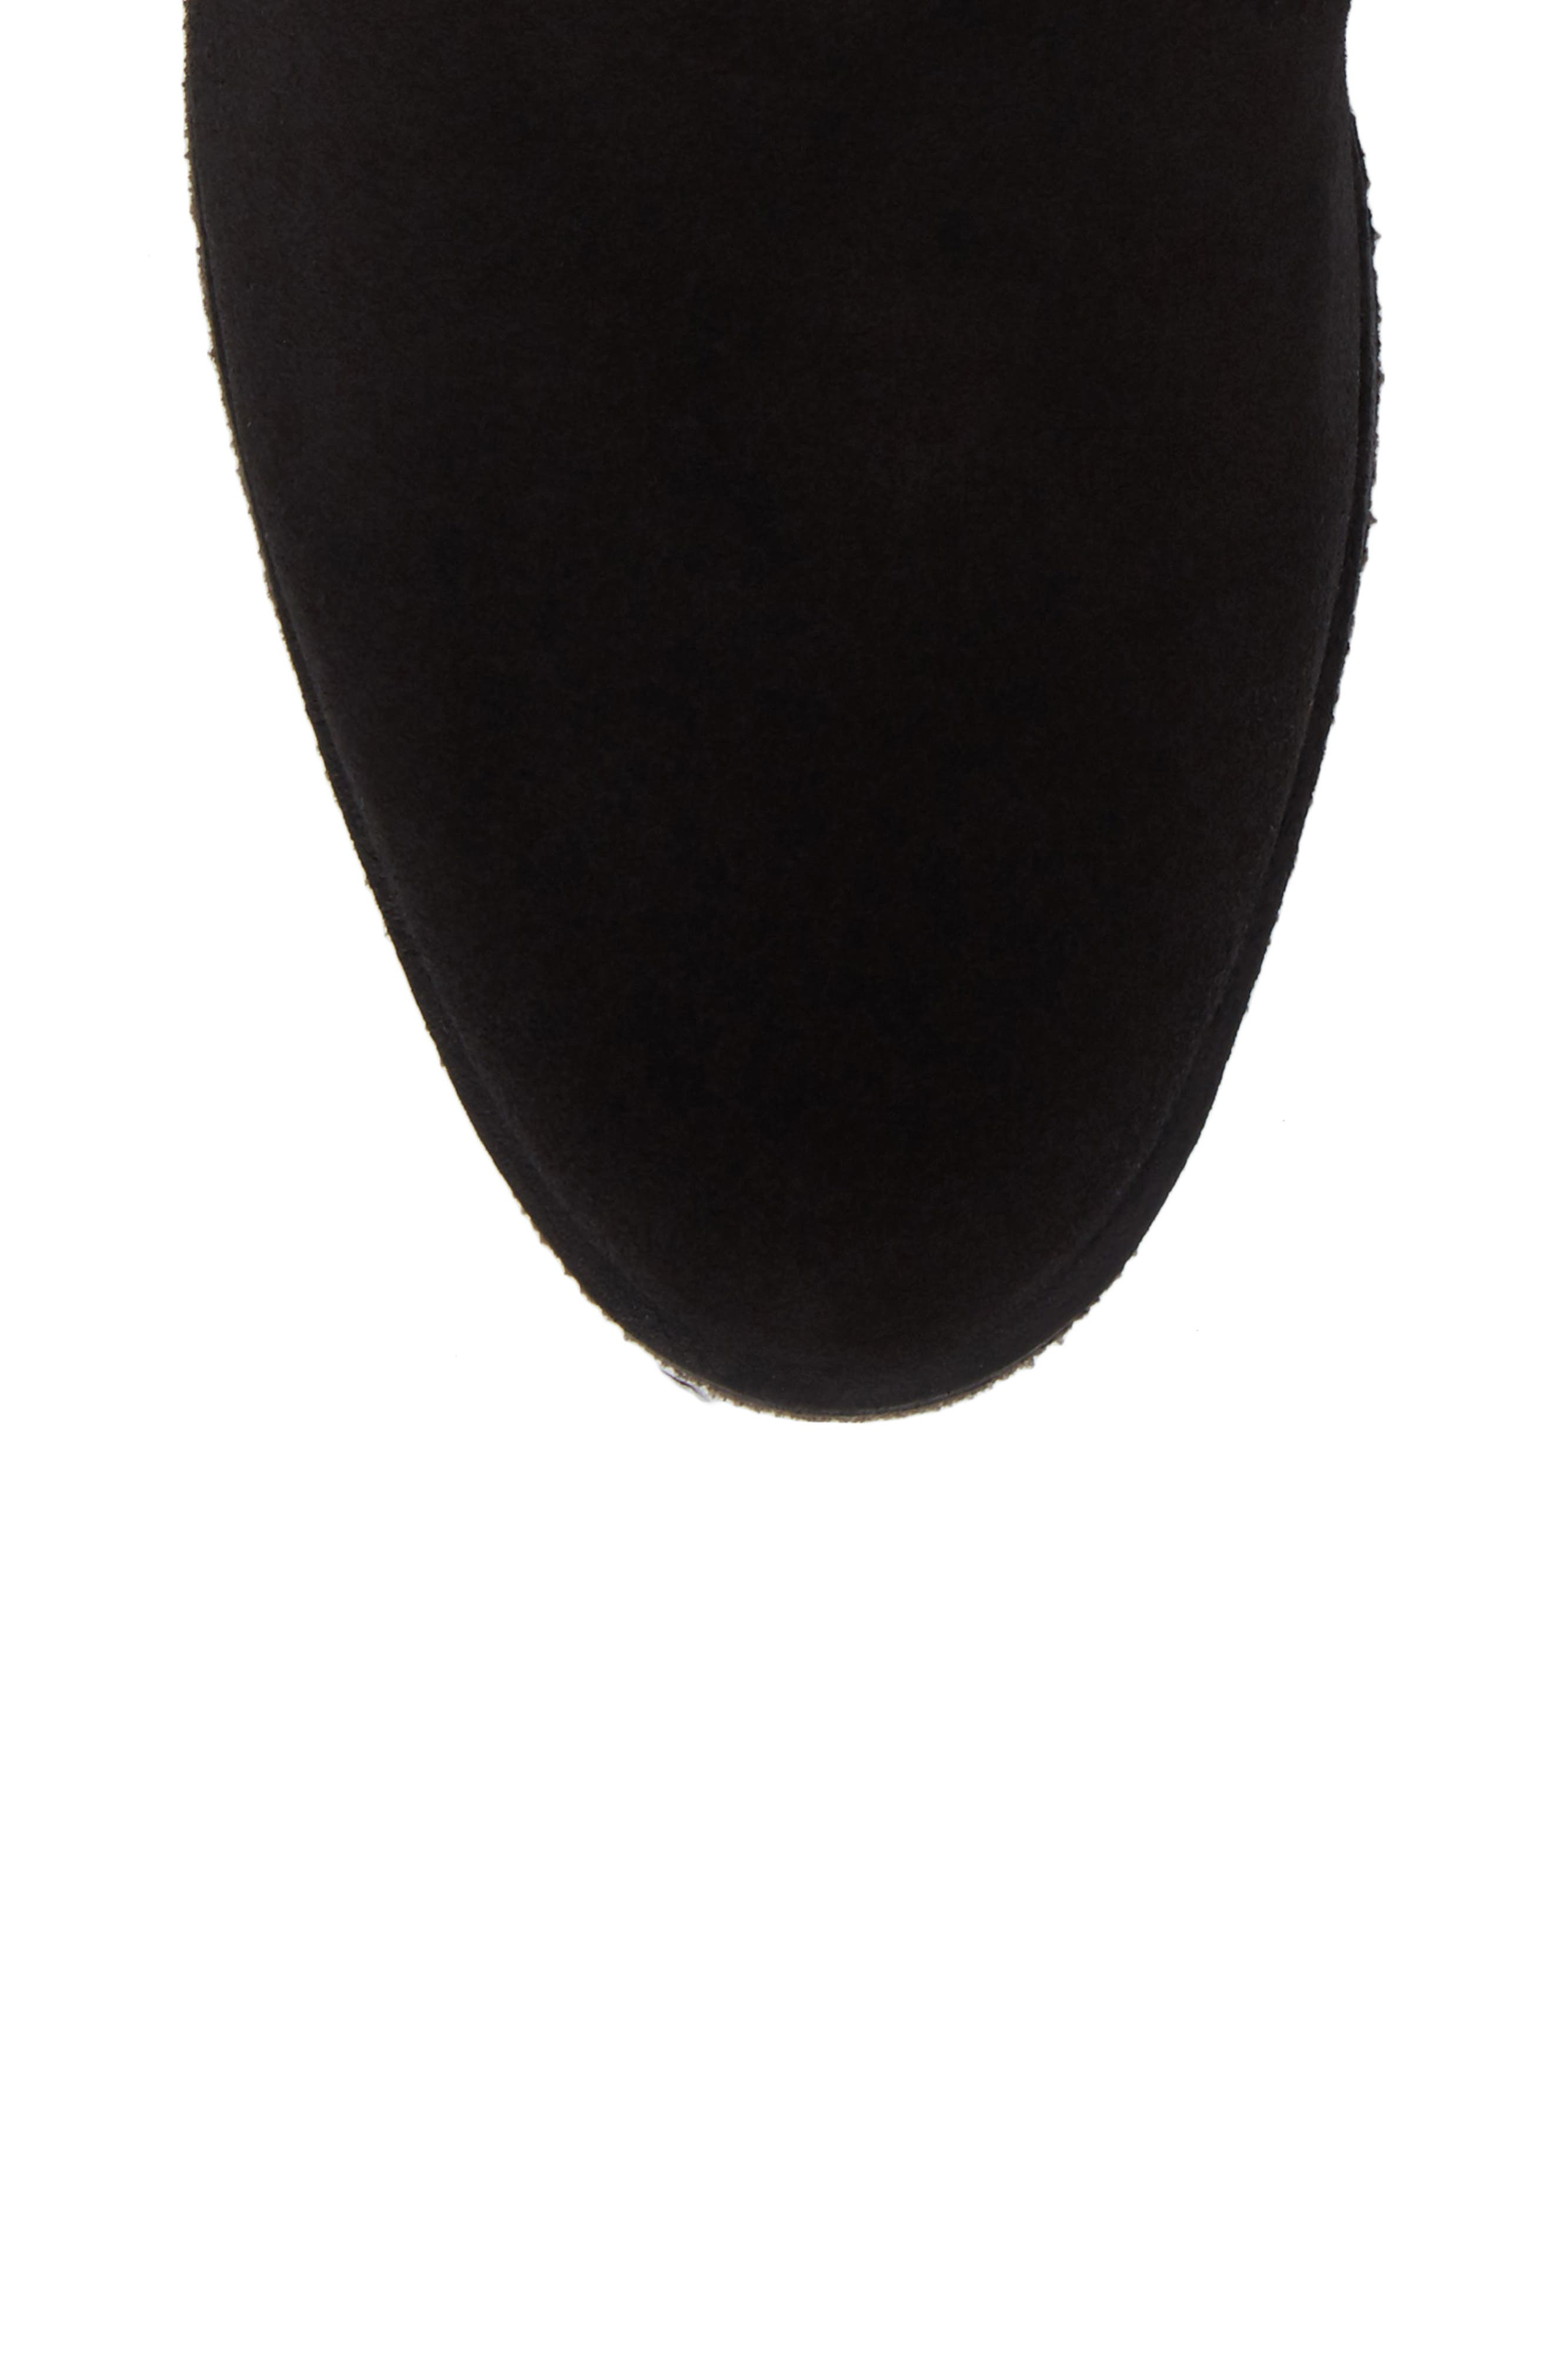 Bristol Bootie,                             Alternate thumbnail 5, color,                             Black Leather